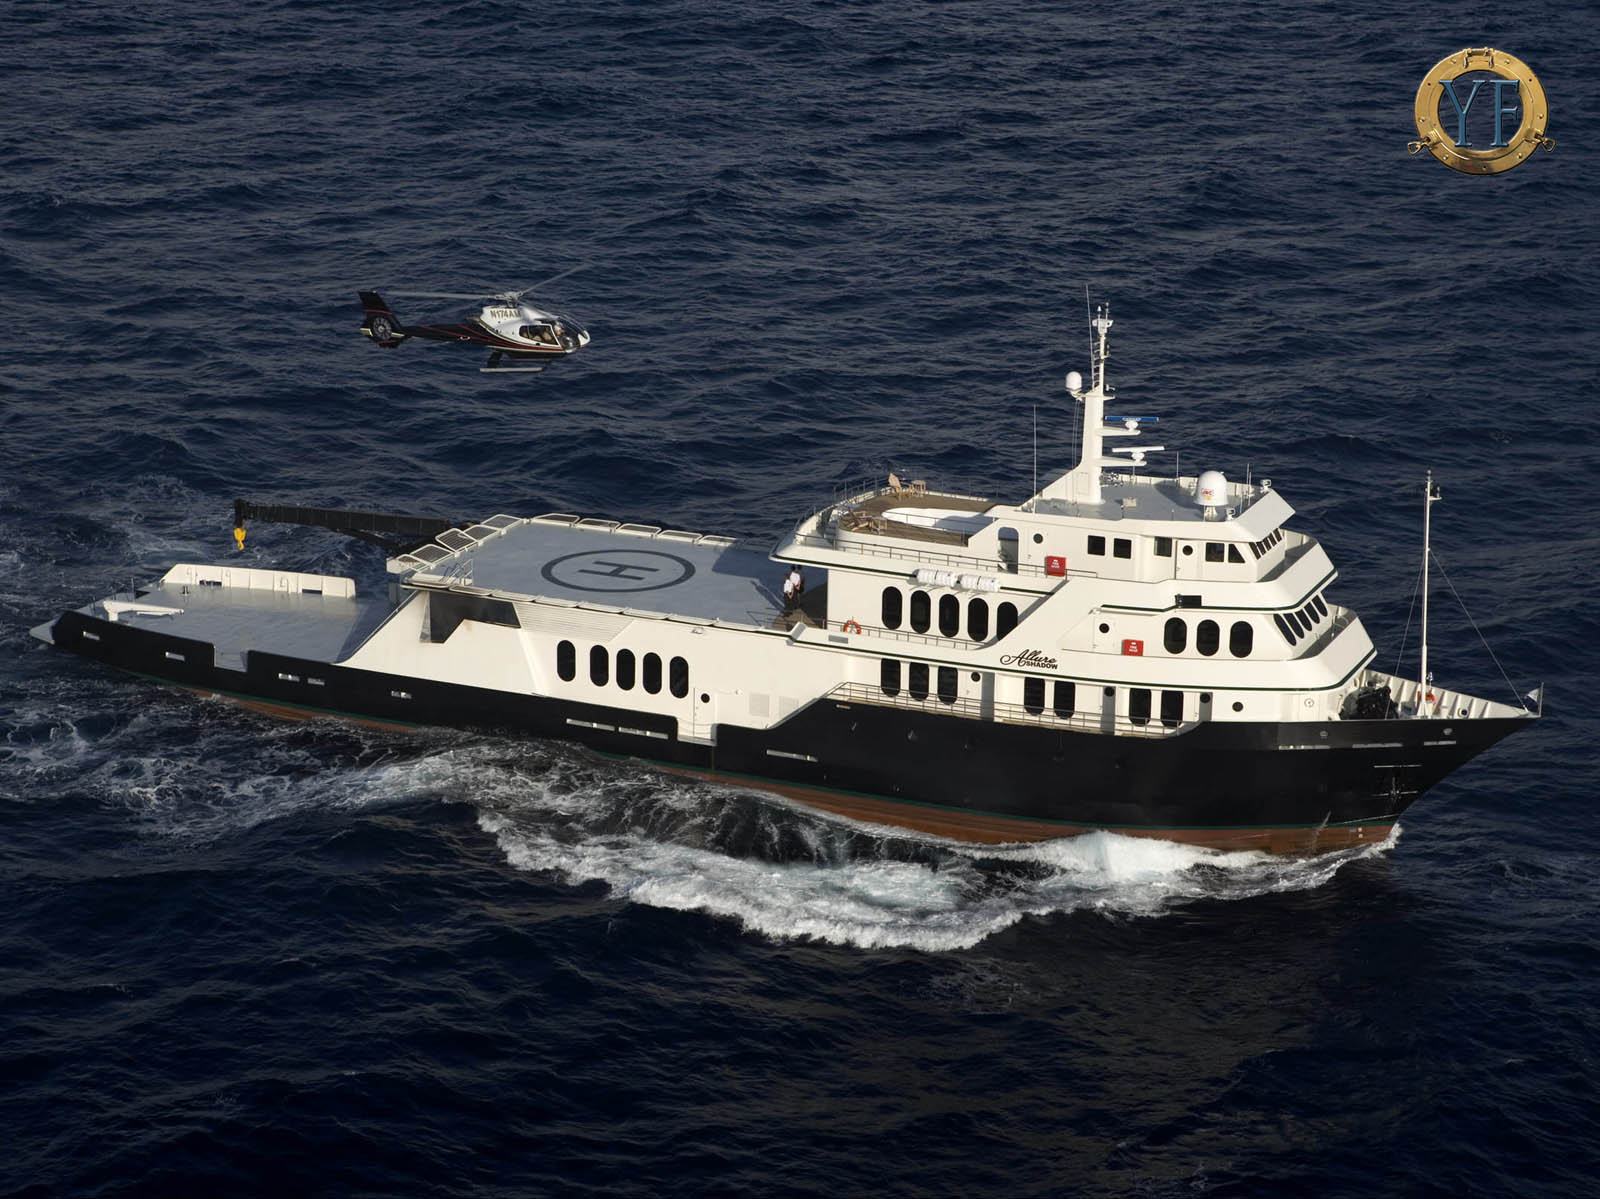 Shadow Marine Yacht Wallpapers Yacht Escort Ships Amp Shadows YachtForums We Know Big Boats